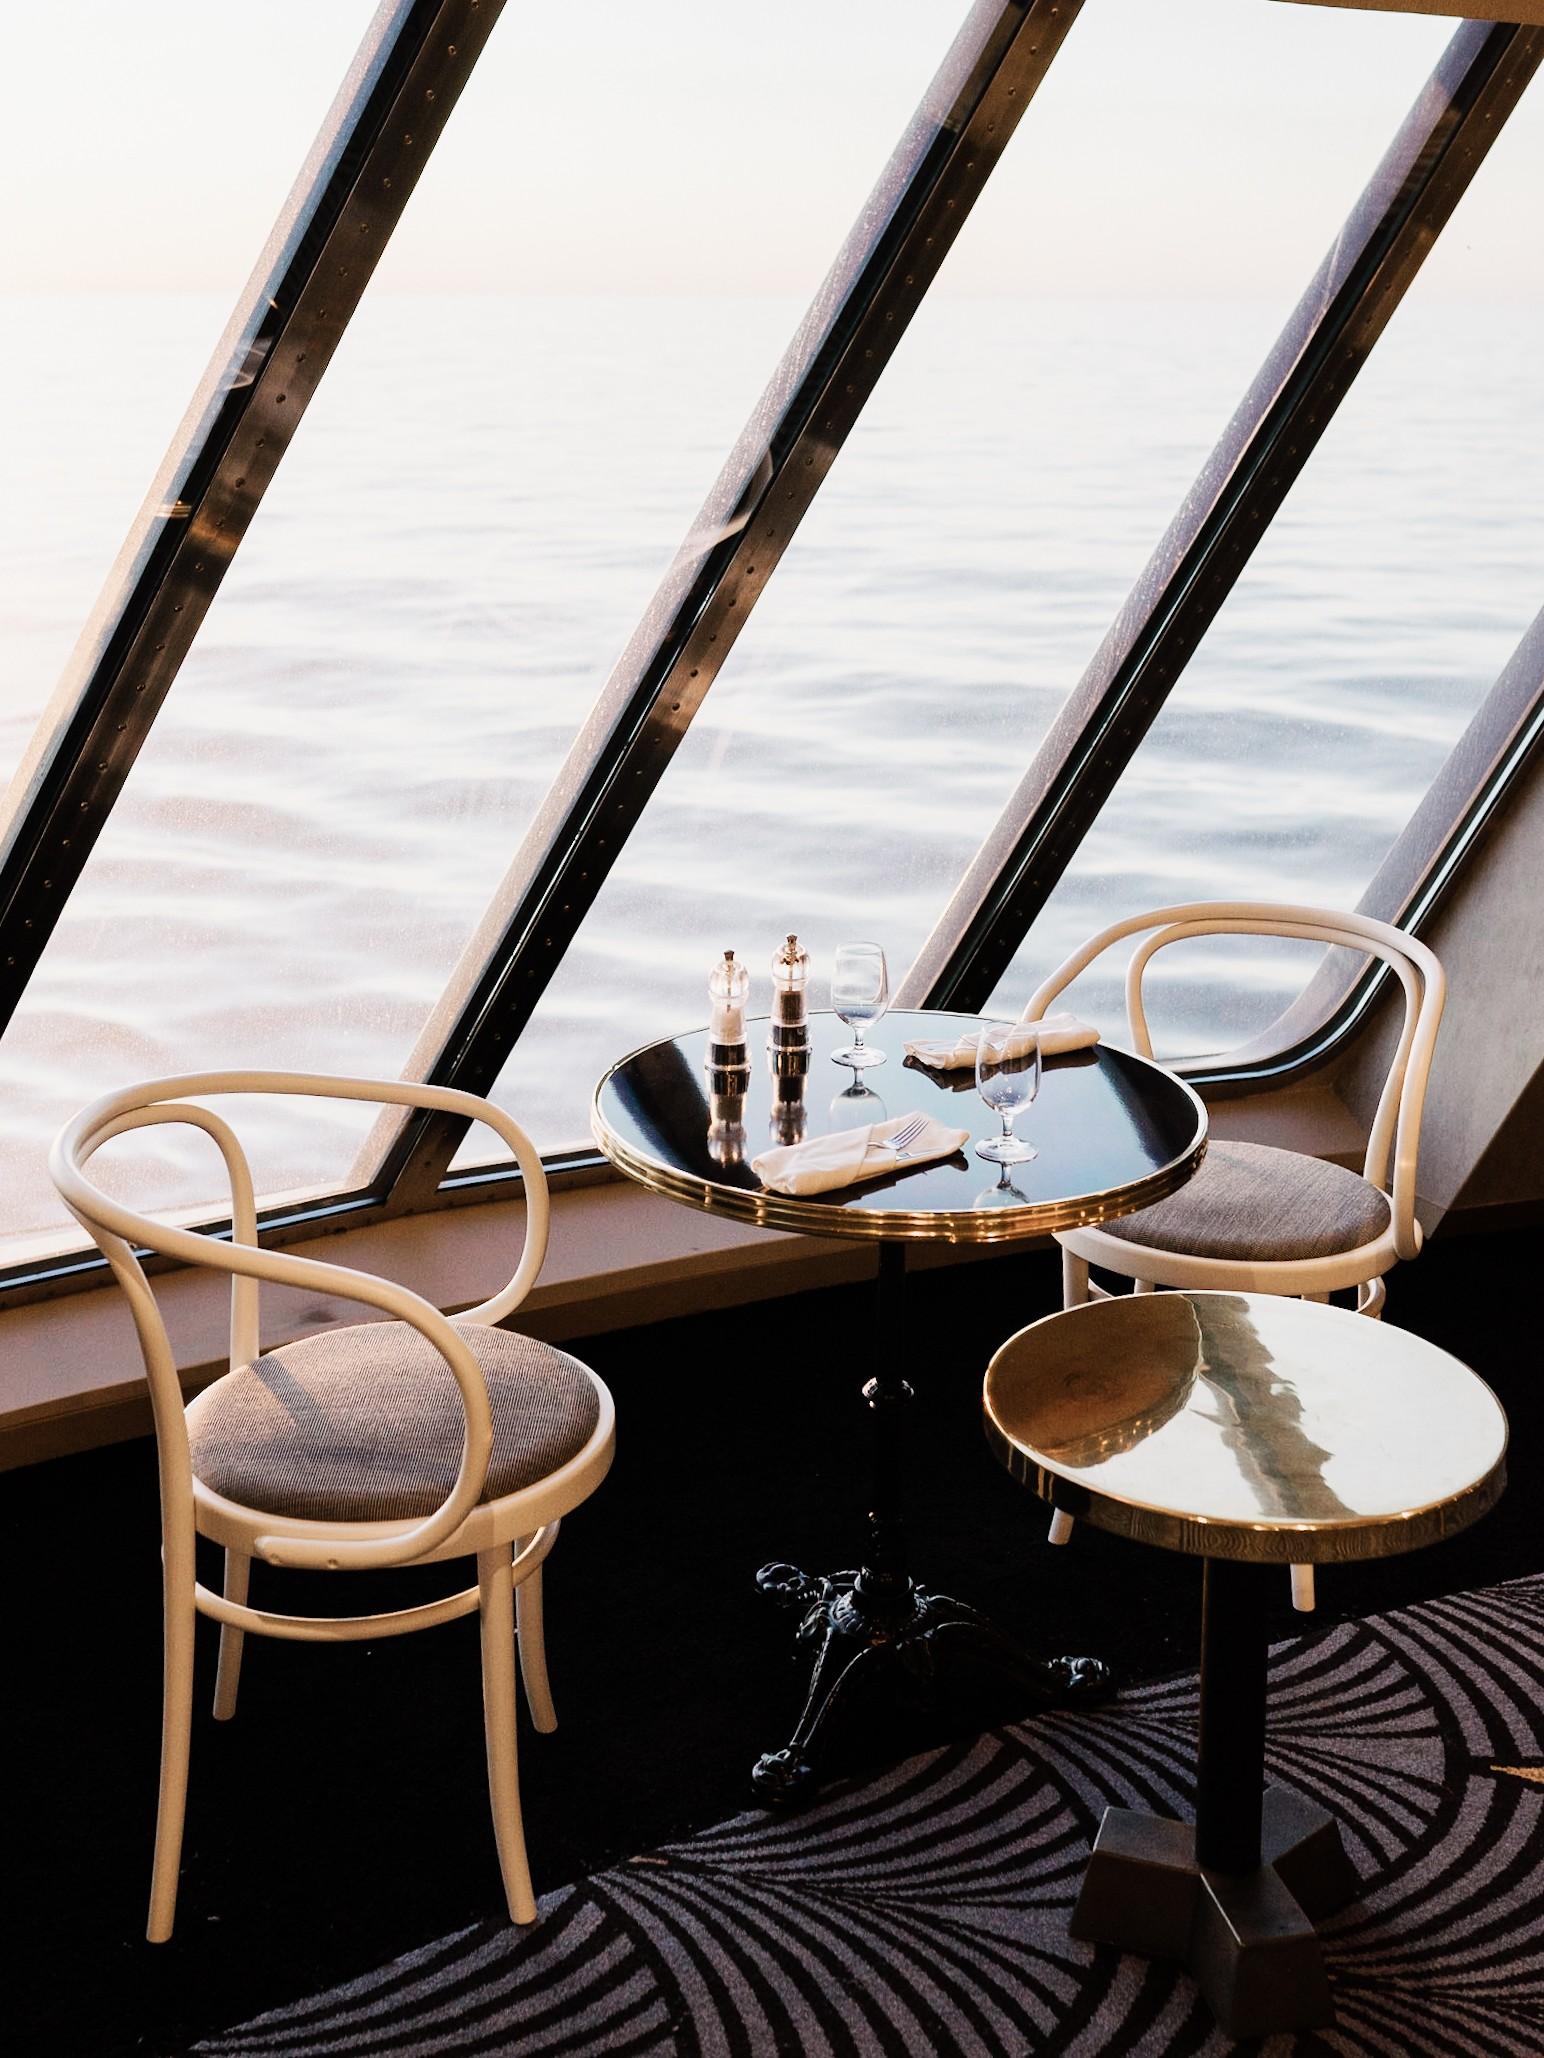 Cafe Lounge Mein Schiff 4 Tui Cruises